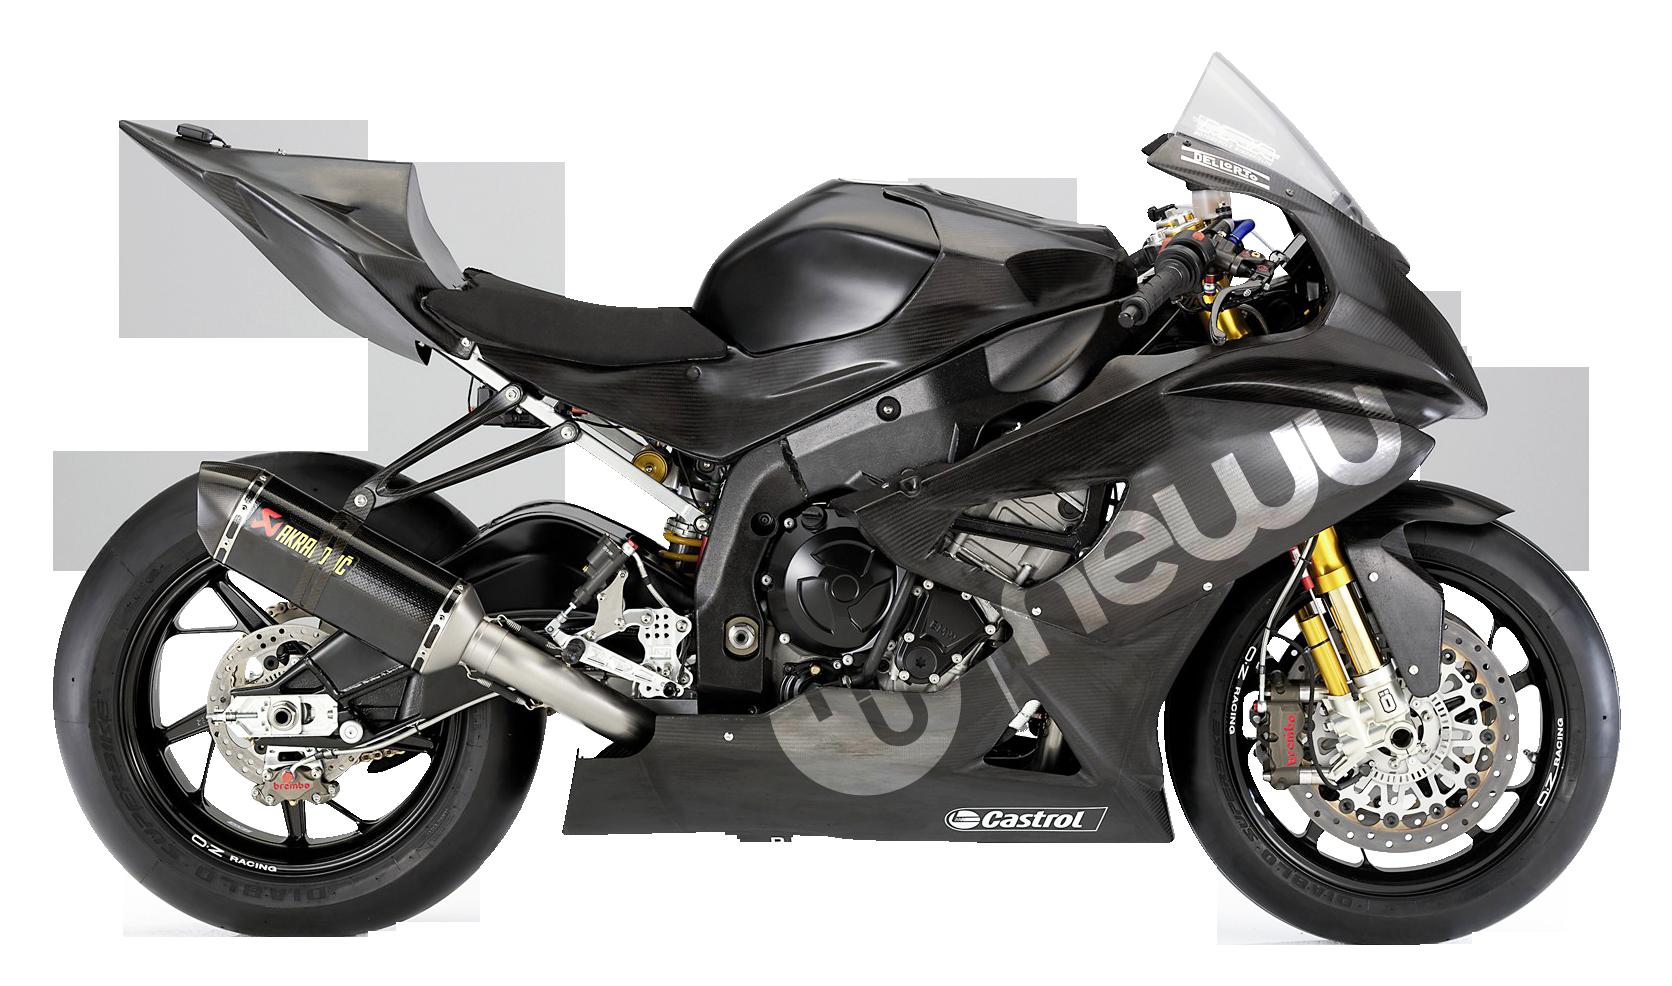 Newu BMW S1000RR Super Bike PNG Image